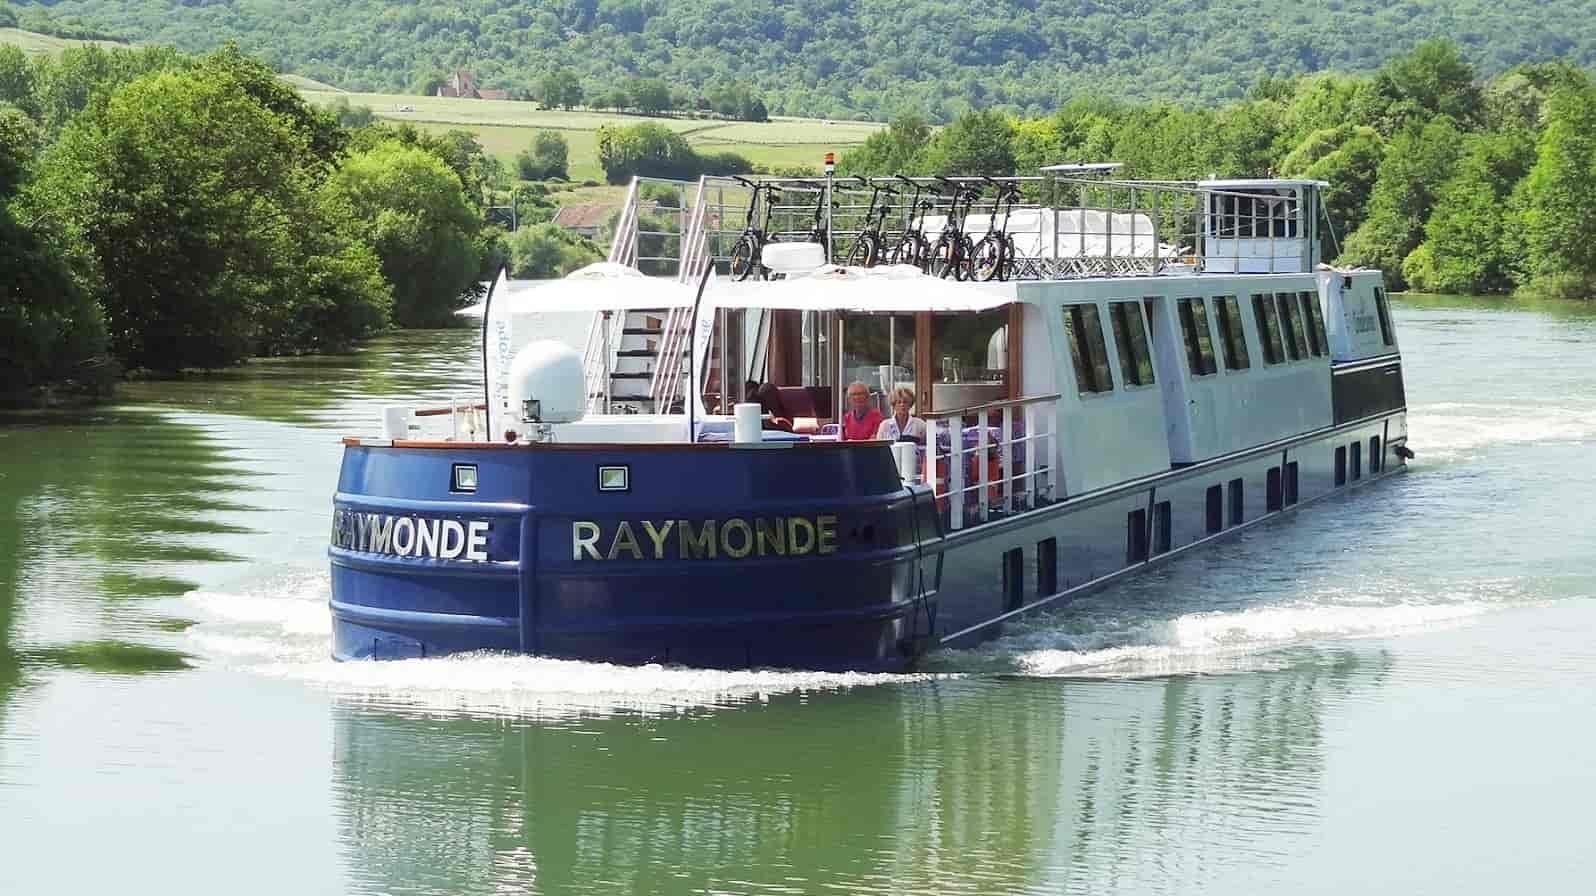 Barge-Raymonde-ulkokuva-©CroisiEurope-1596x896.jpg